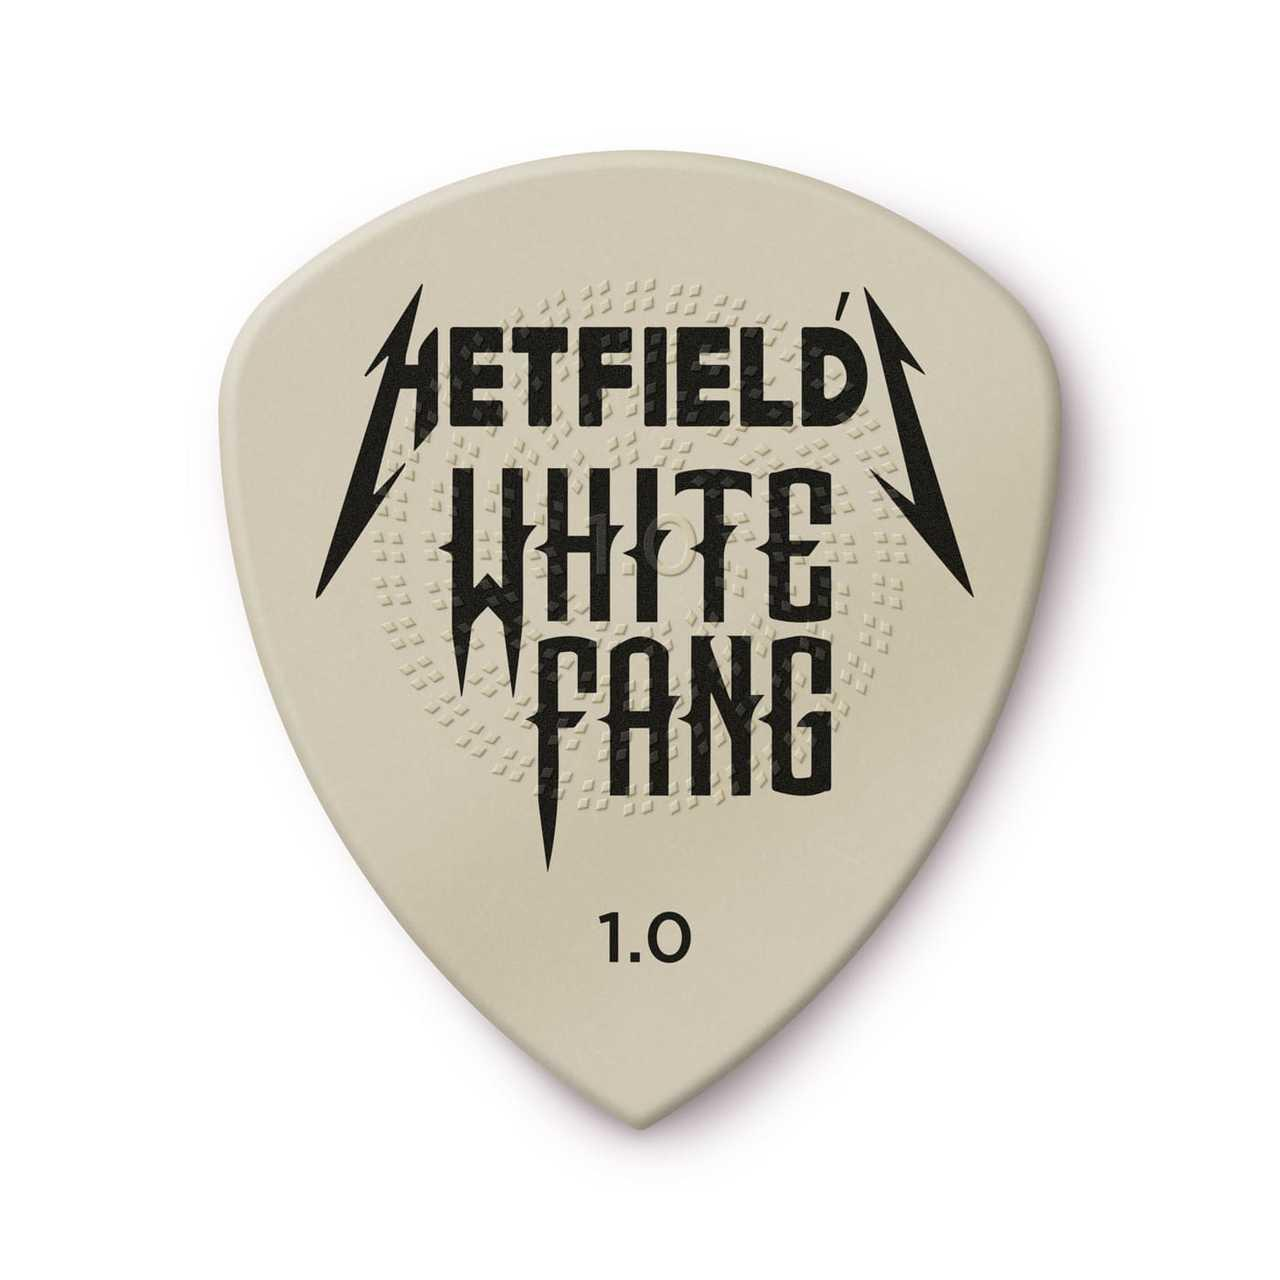 Набор медиаторов Dunlop PH122P1.00 Hetfield's White Fang Custom Flow Pick 1.00mm (6 Pack)